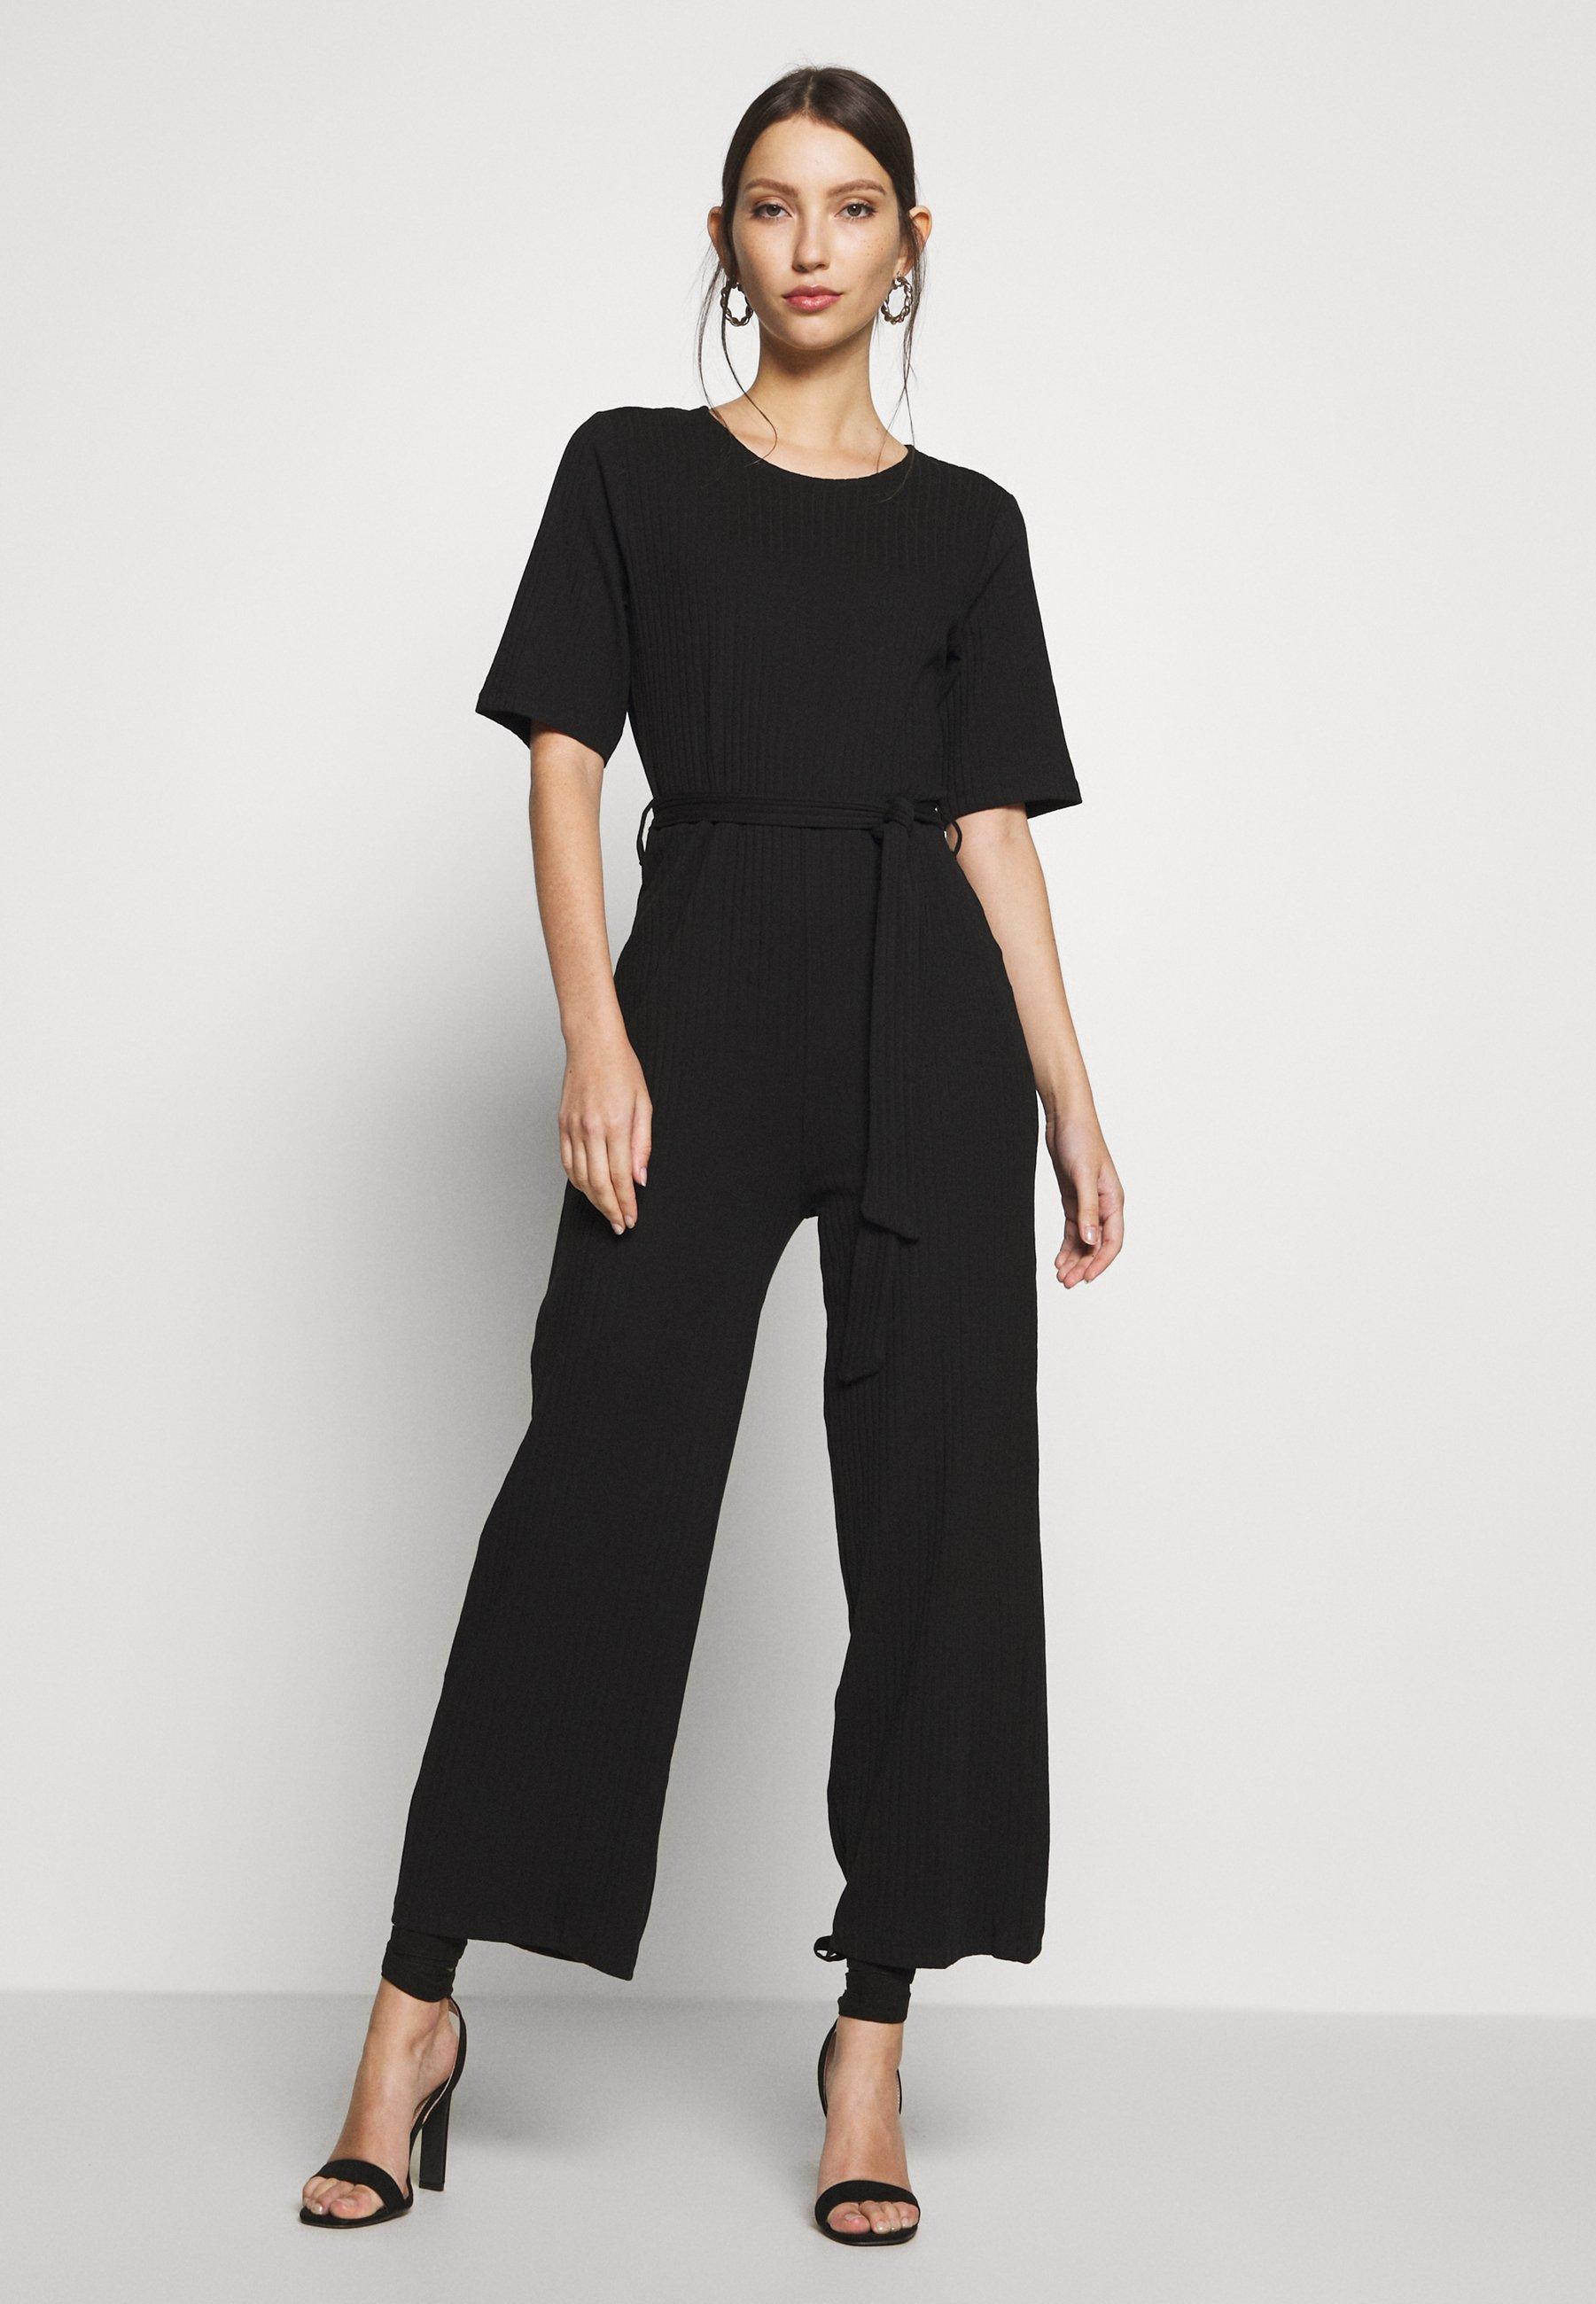 Women BASIC - Ribbed short sleeves belted jumpsuit - Jumpsuit